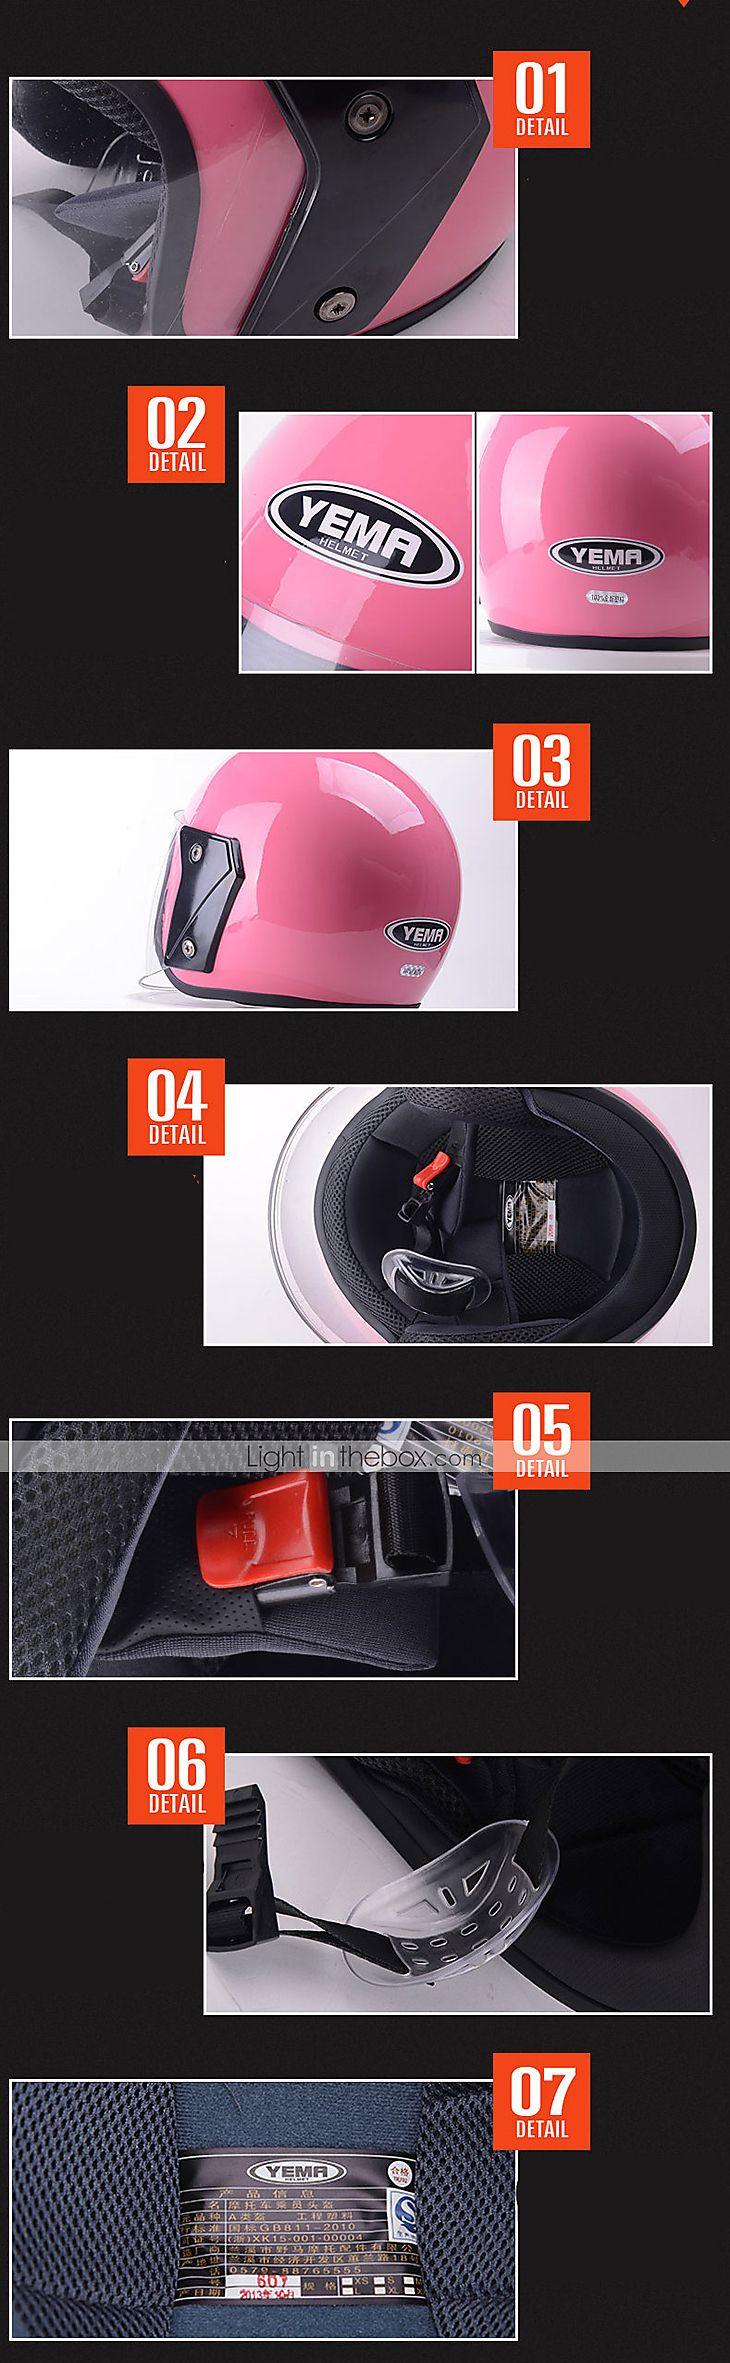 Medio Casco Anti-UV Respirante Los cascos de motocicleta